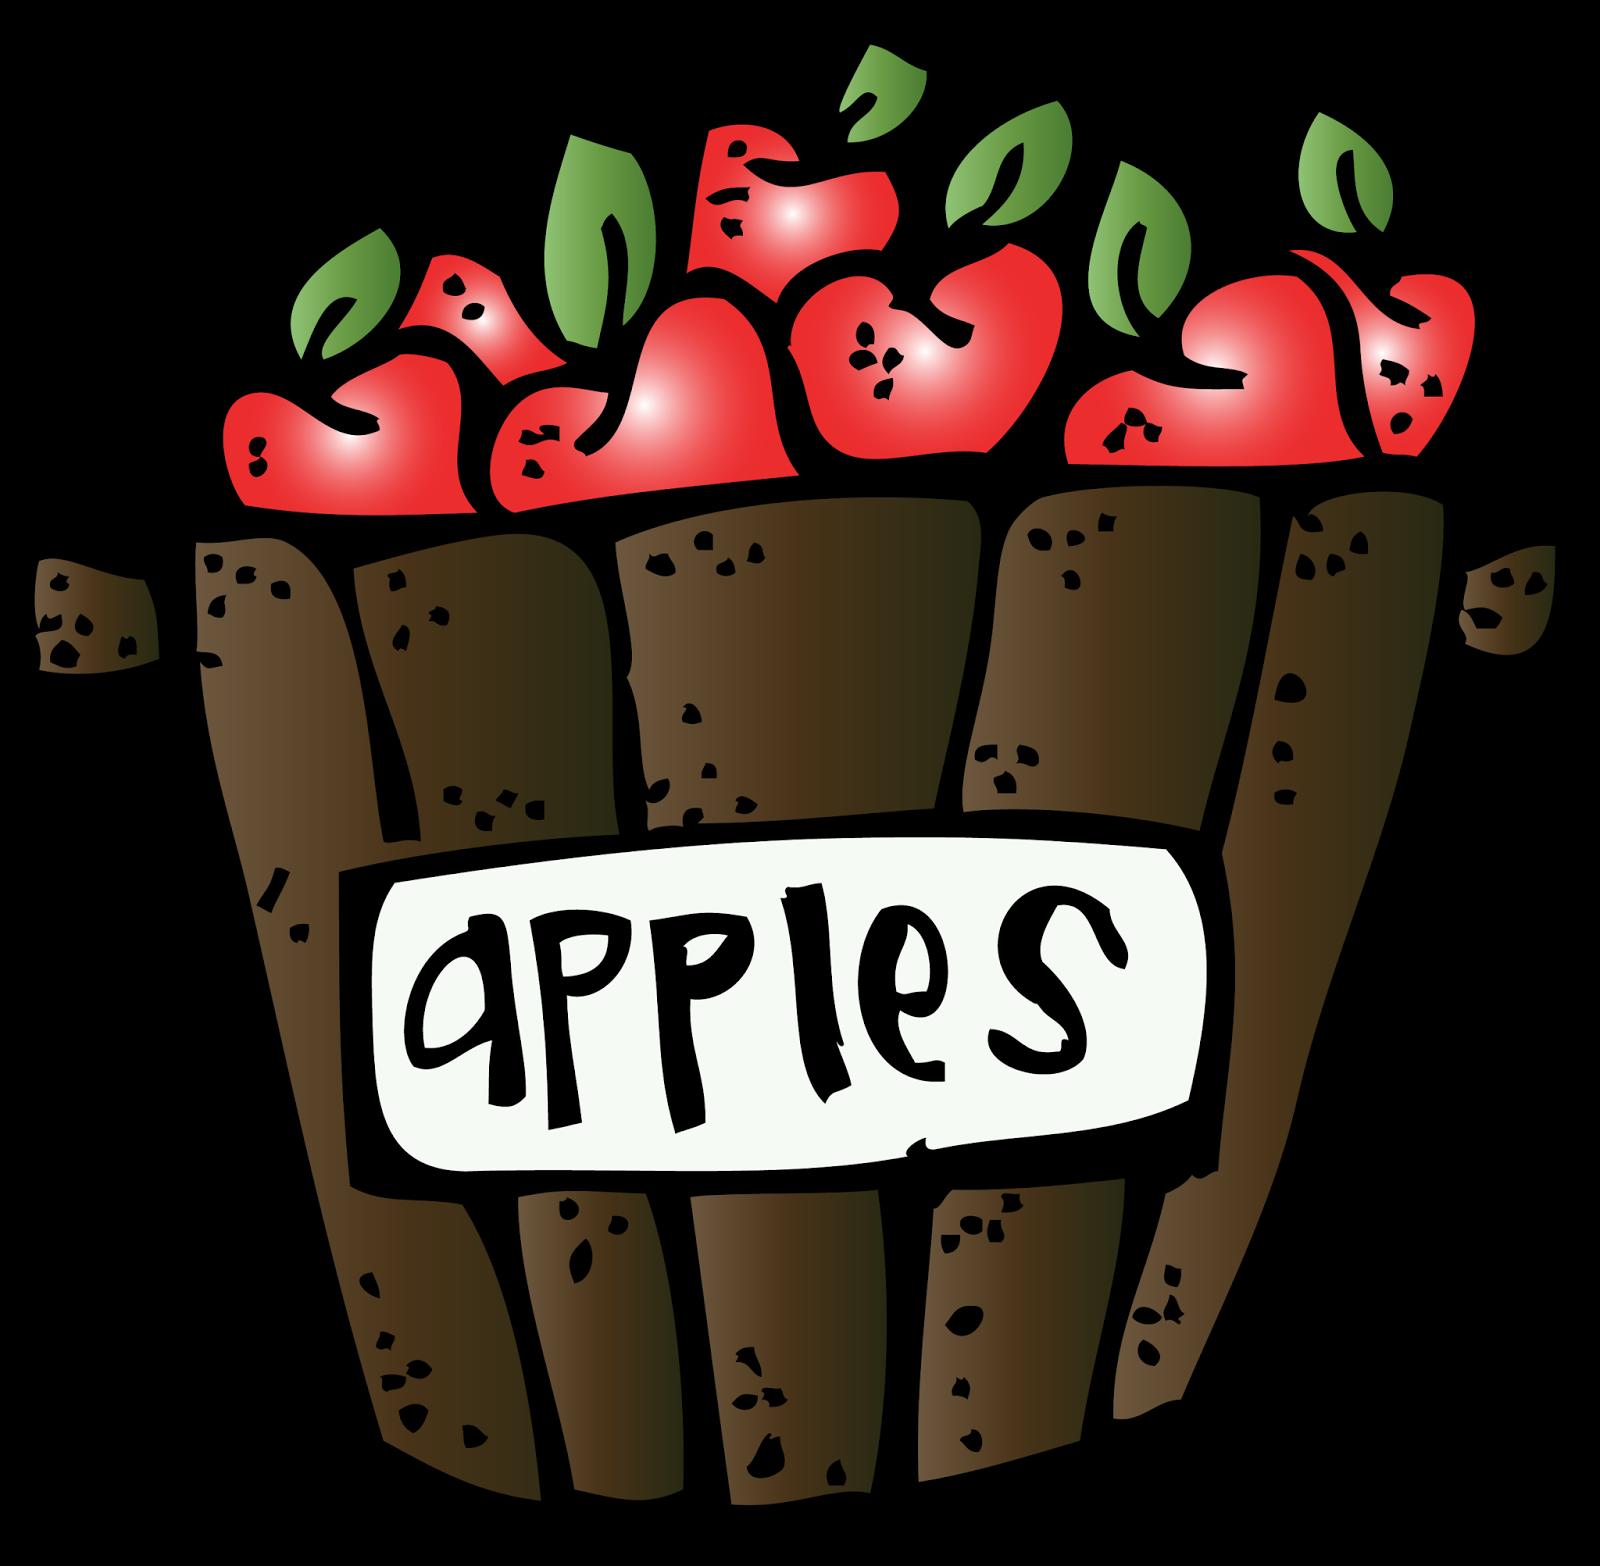 The peterson post homework. Melonheadz clipart apple